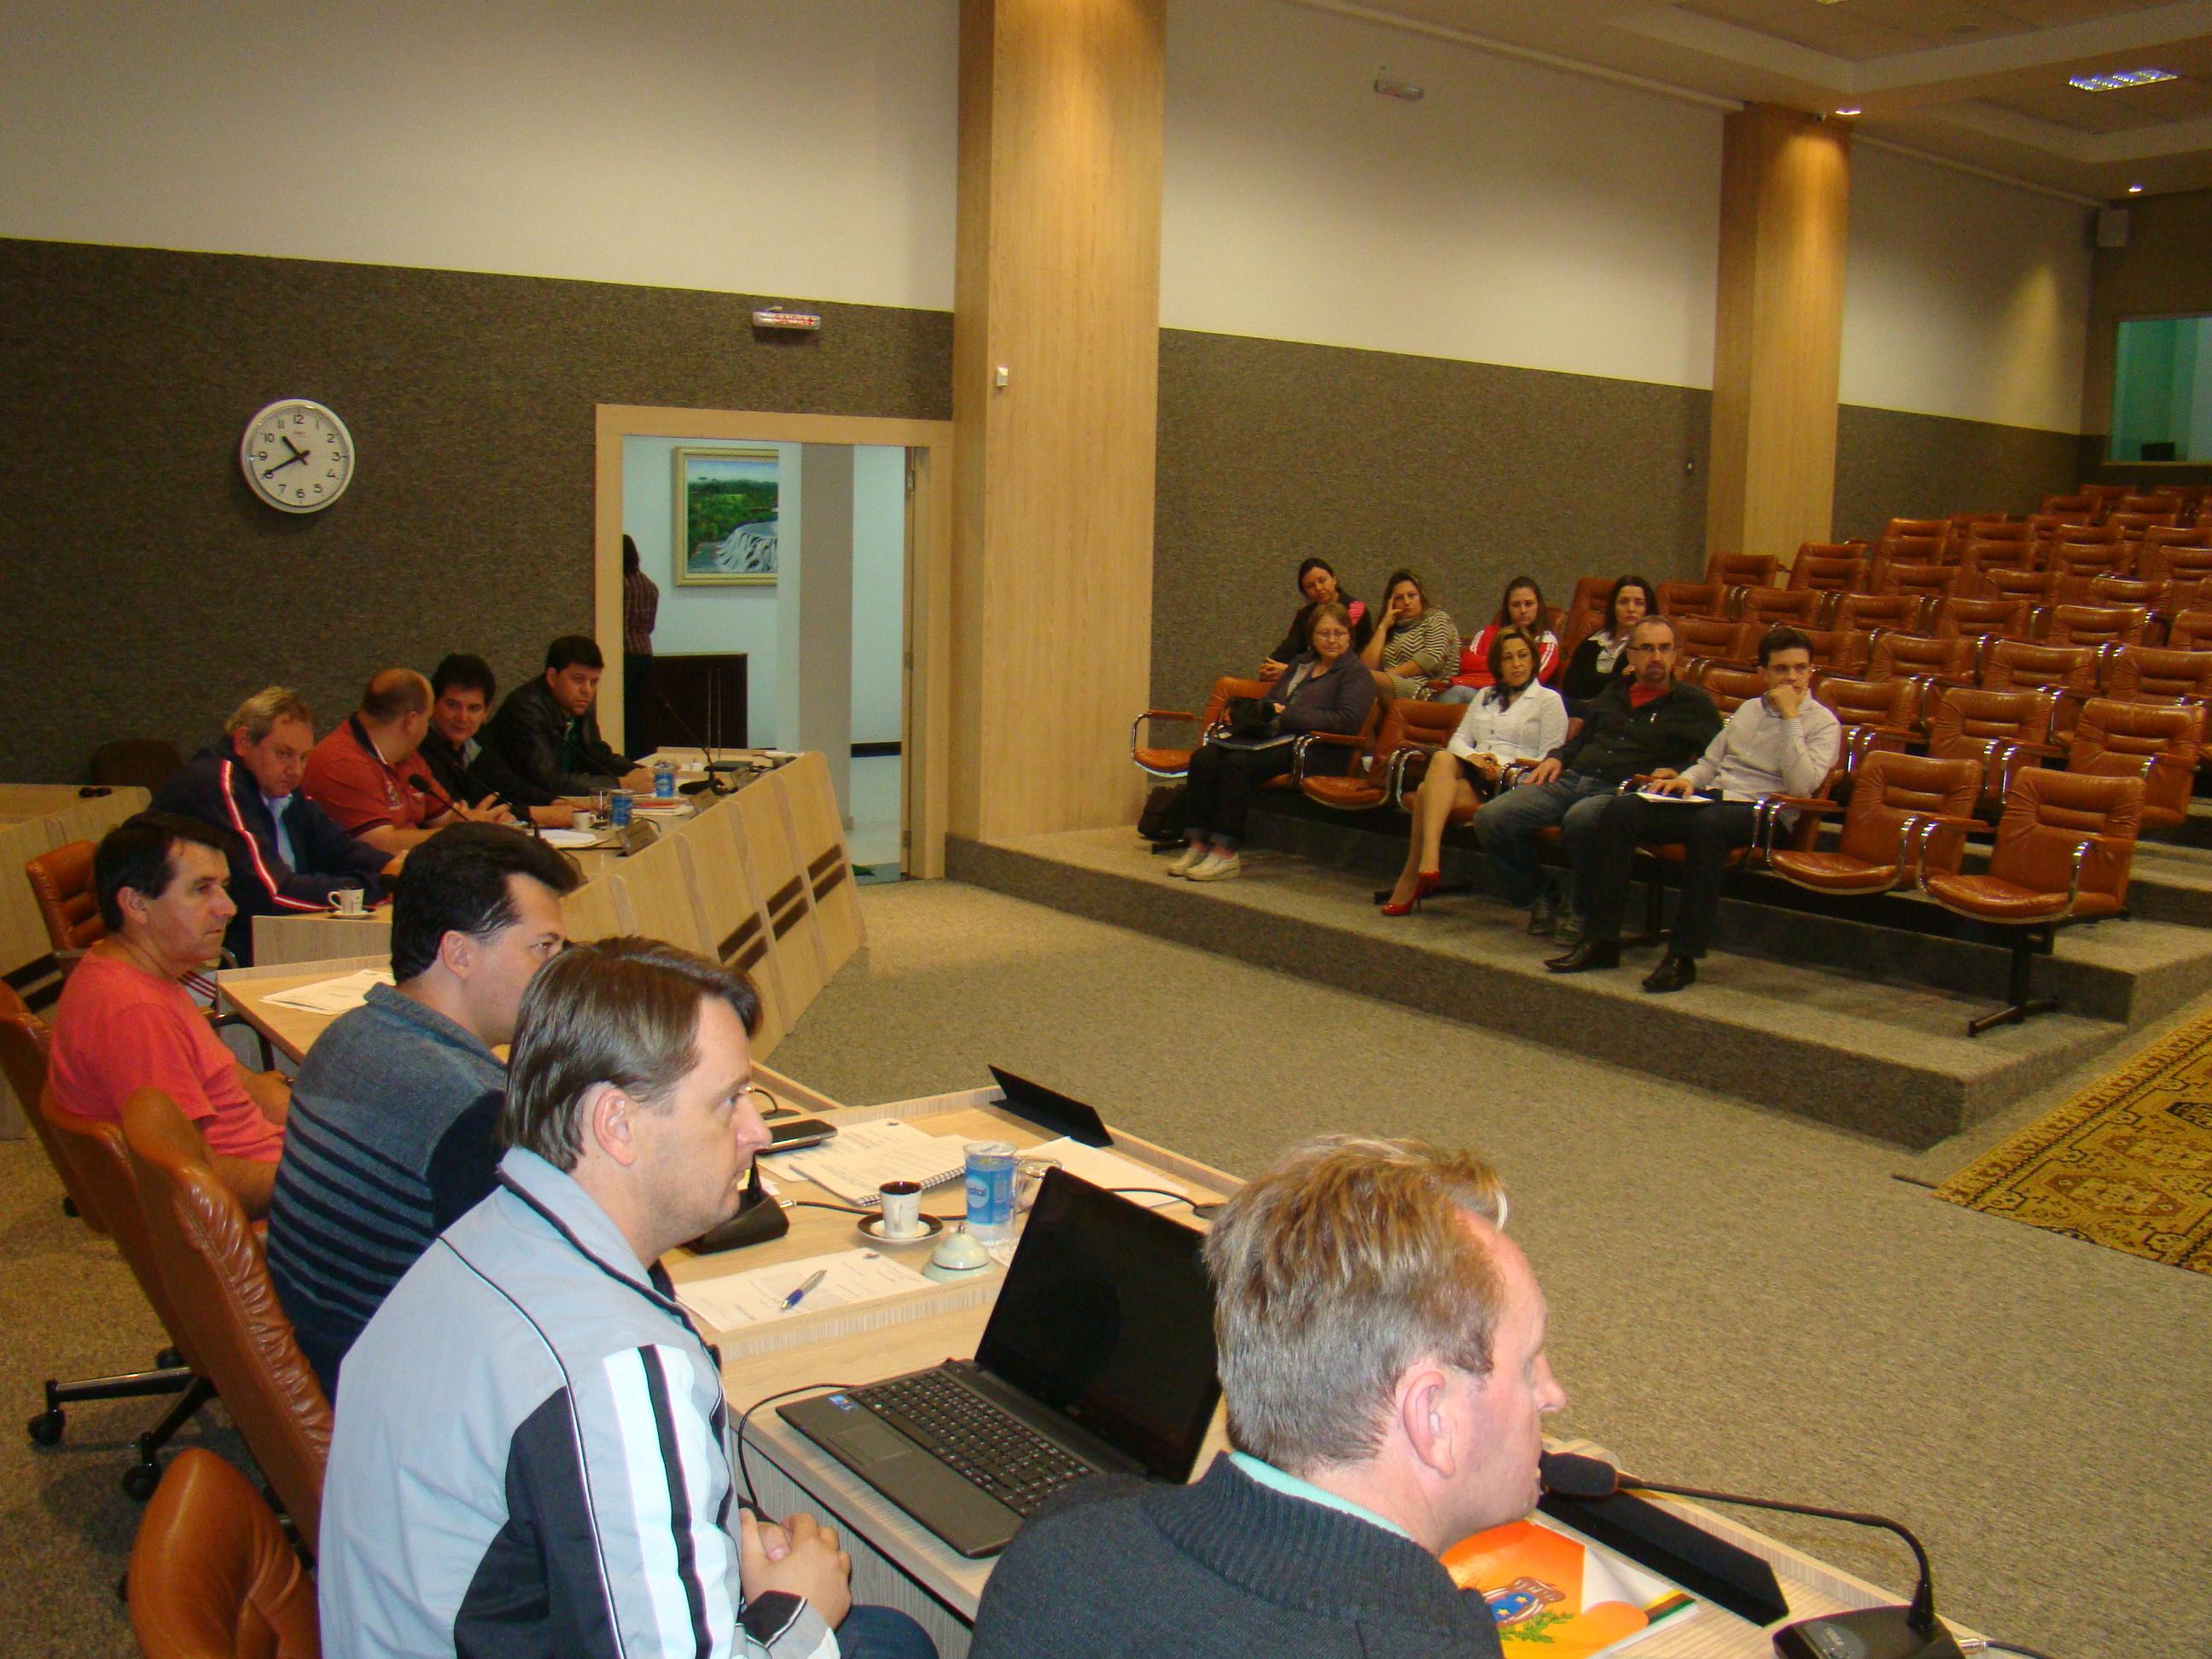 Vereadores levantaram diversas quest�es sobre os projetos, junto aos secret�rios presentes.